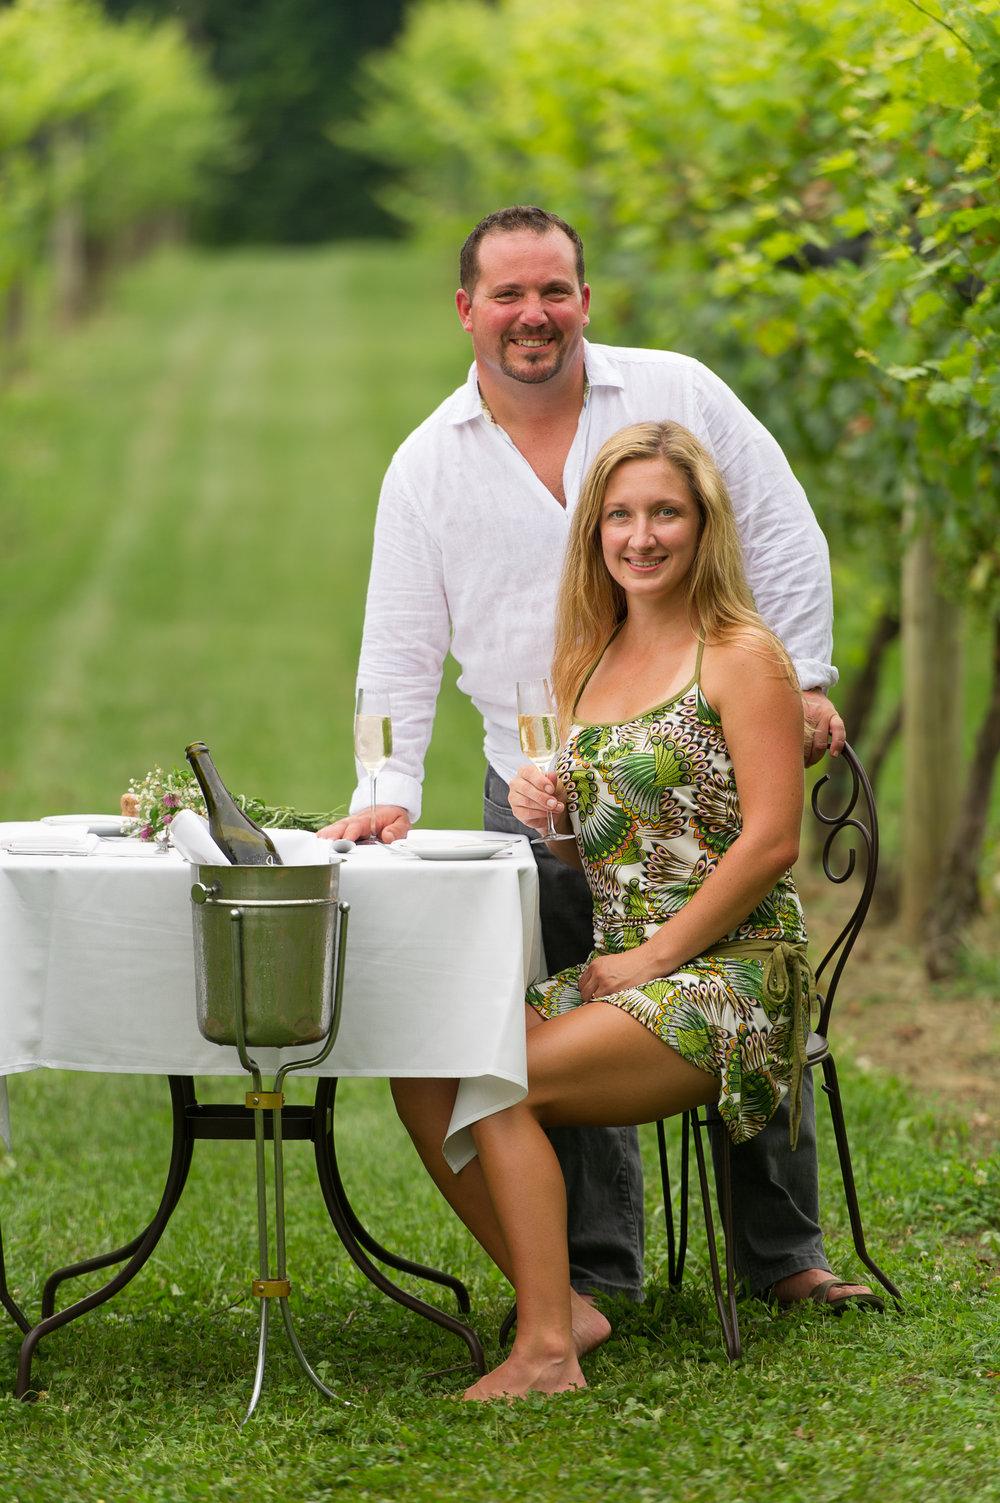 Who is Jean Farris? - Benjamin Farris O'Daniel and Jeanie Lynn Looney O'Daniel founded Jean Farris Winery & Bistro August 2003.